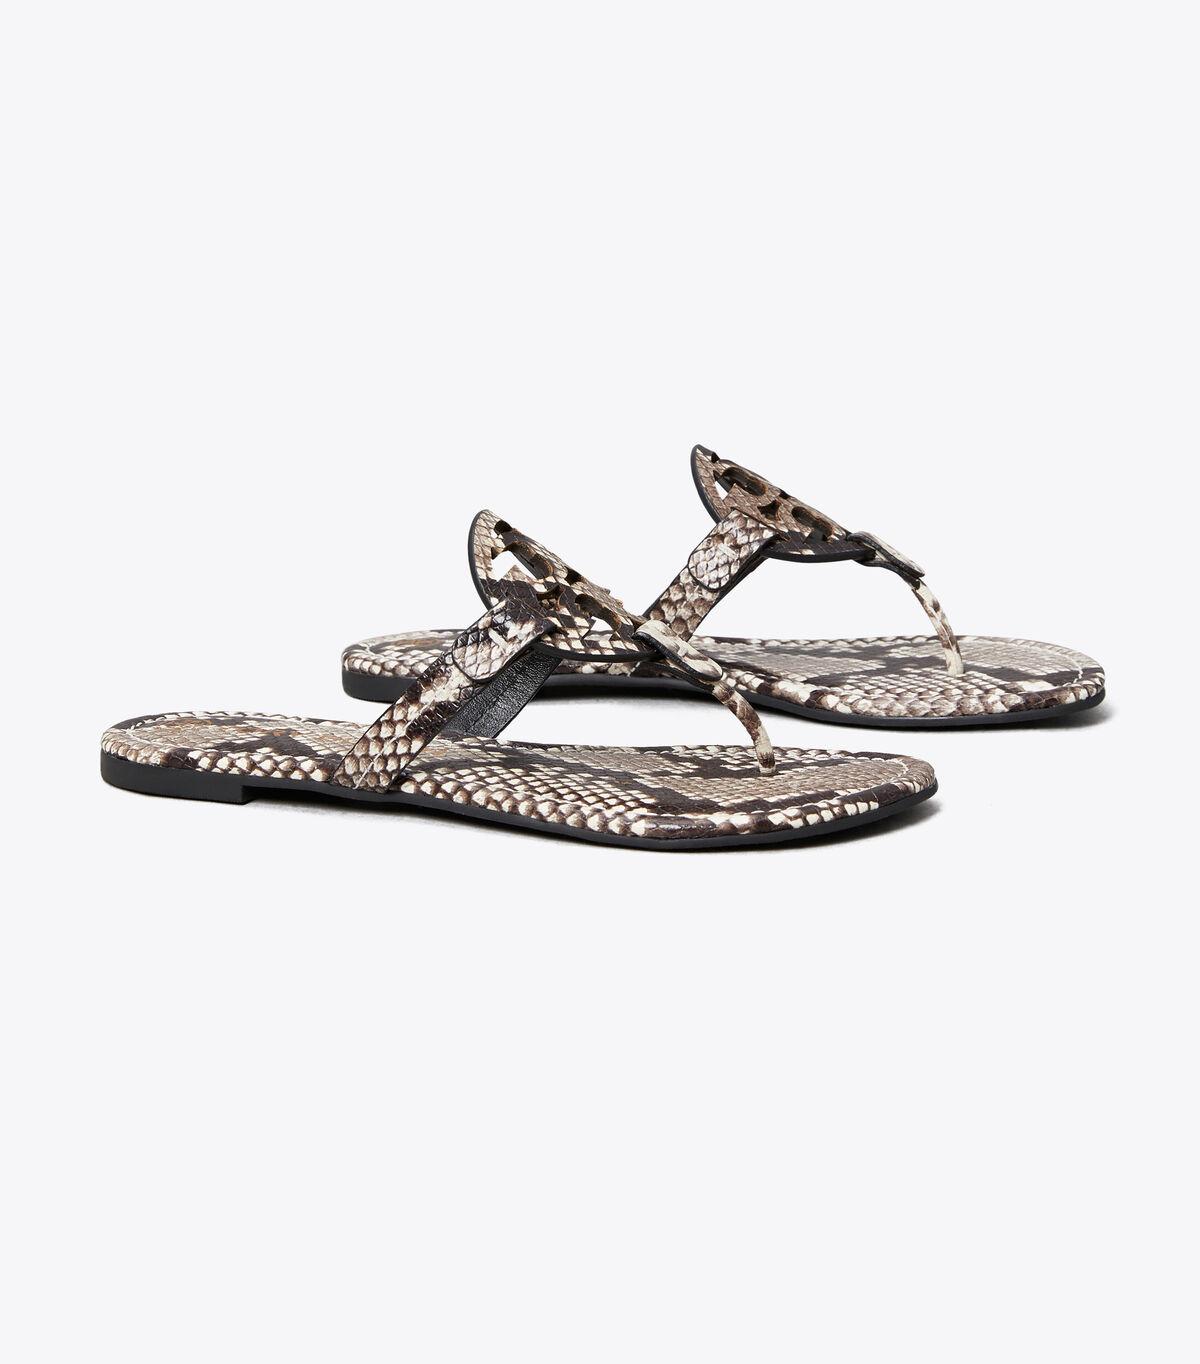 Miller Sandal, Embossed Leather